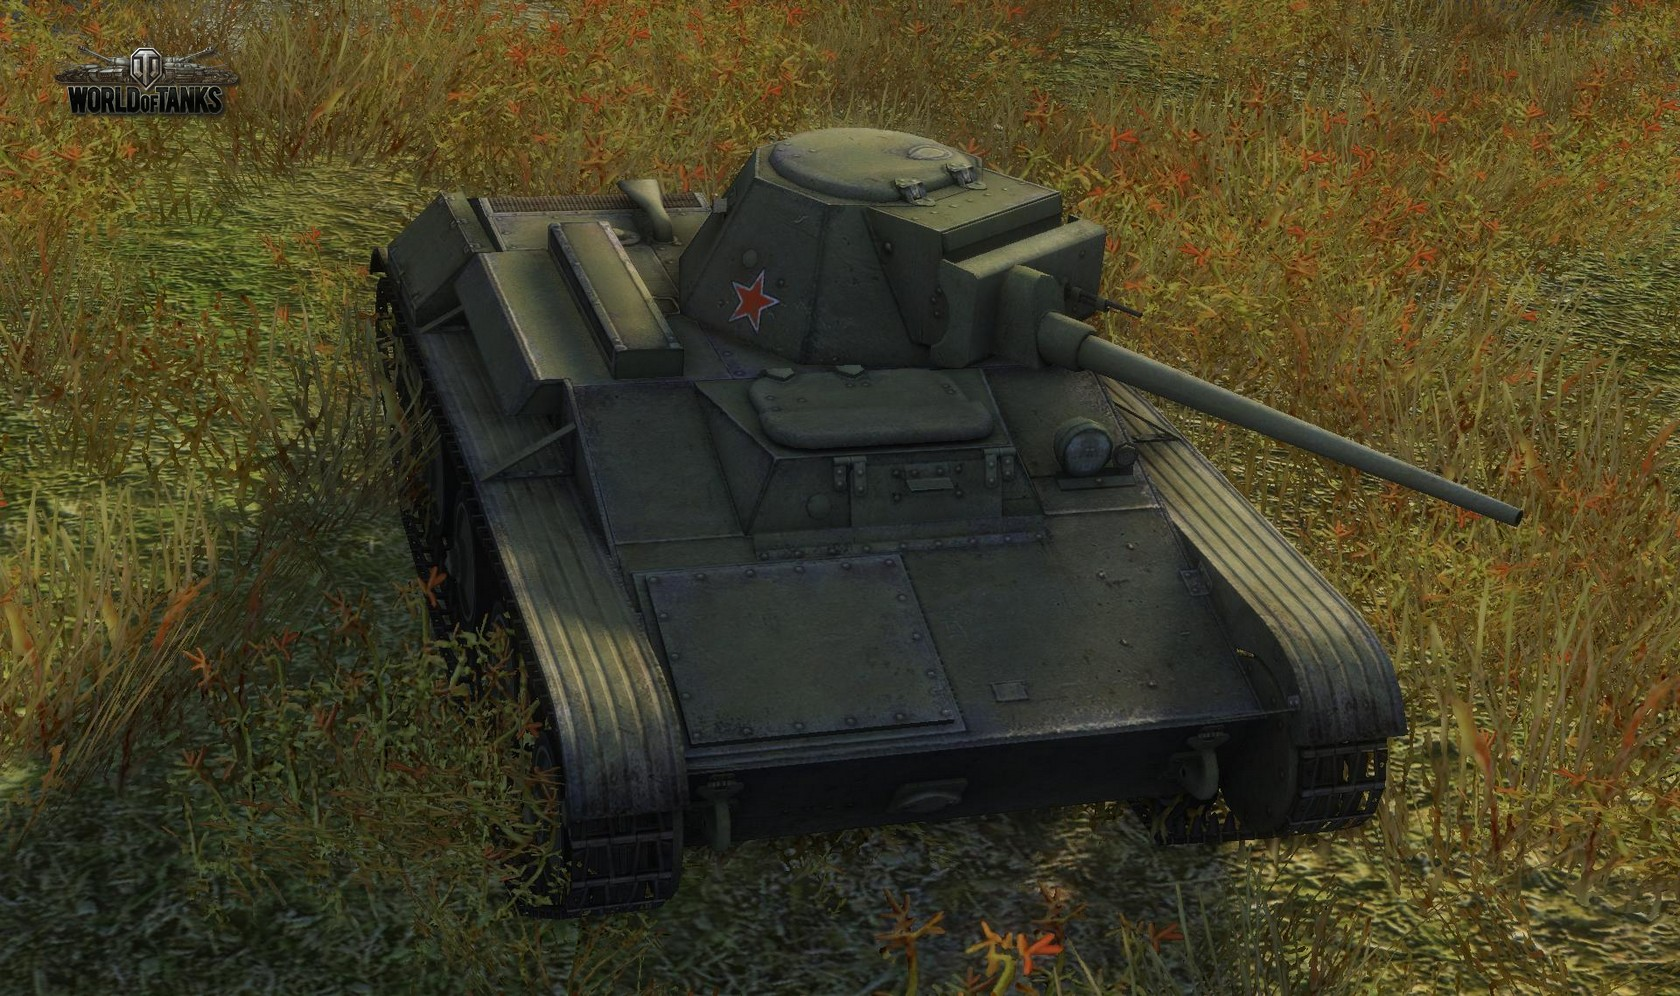 окончании ворлд оф танк все танки фото и название геометрическая фигура карандашей